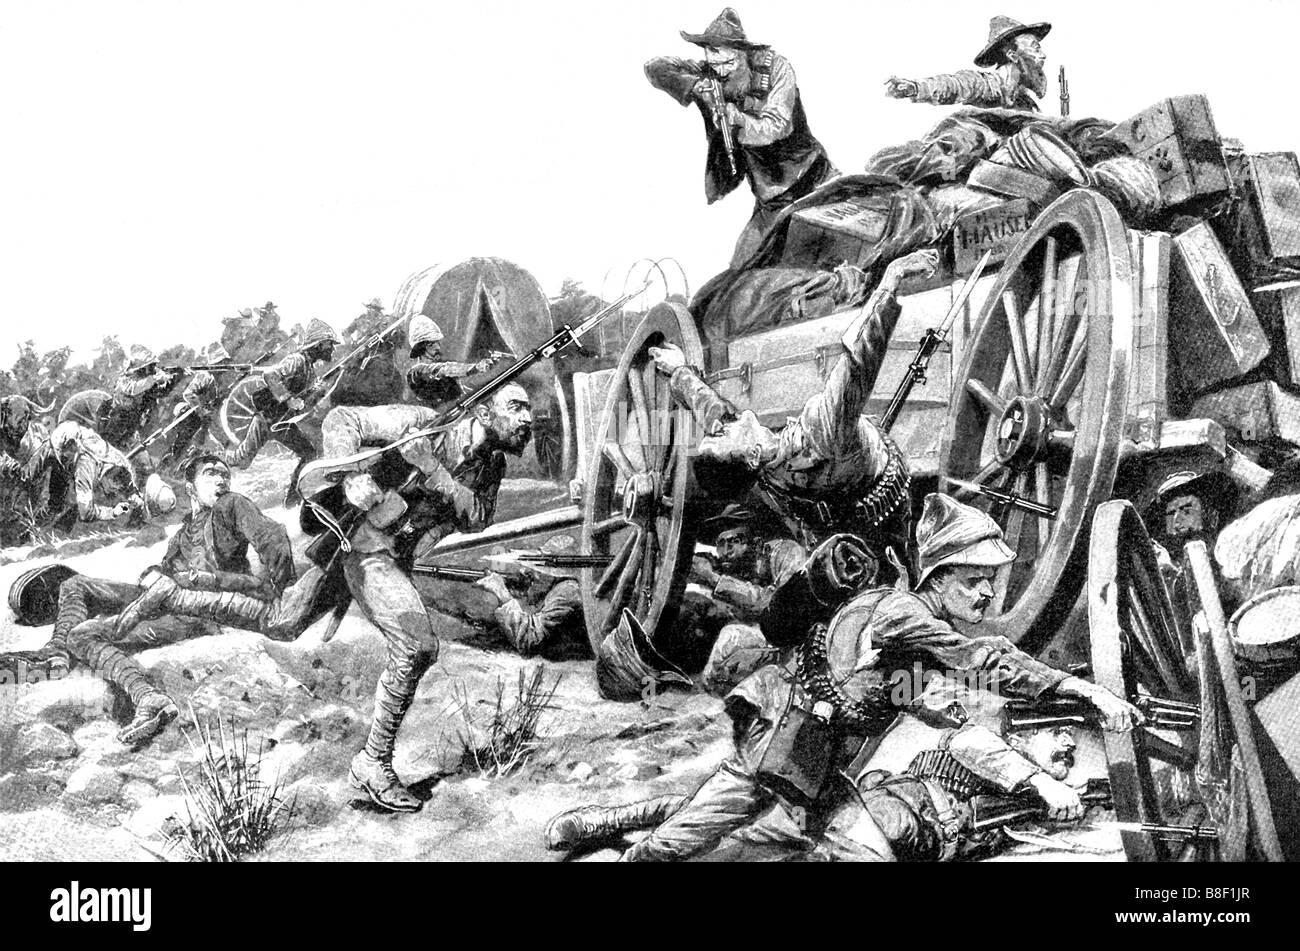 Boer Assault on British Colony - Stock Image